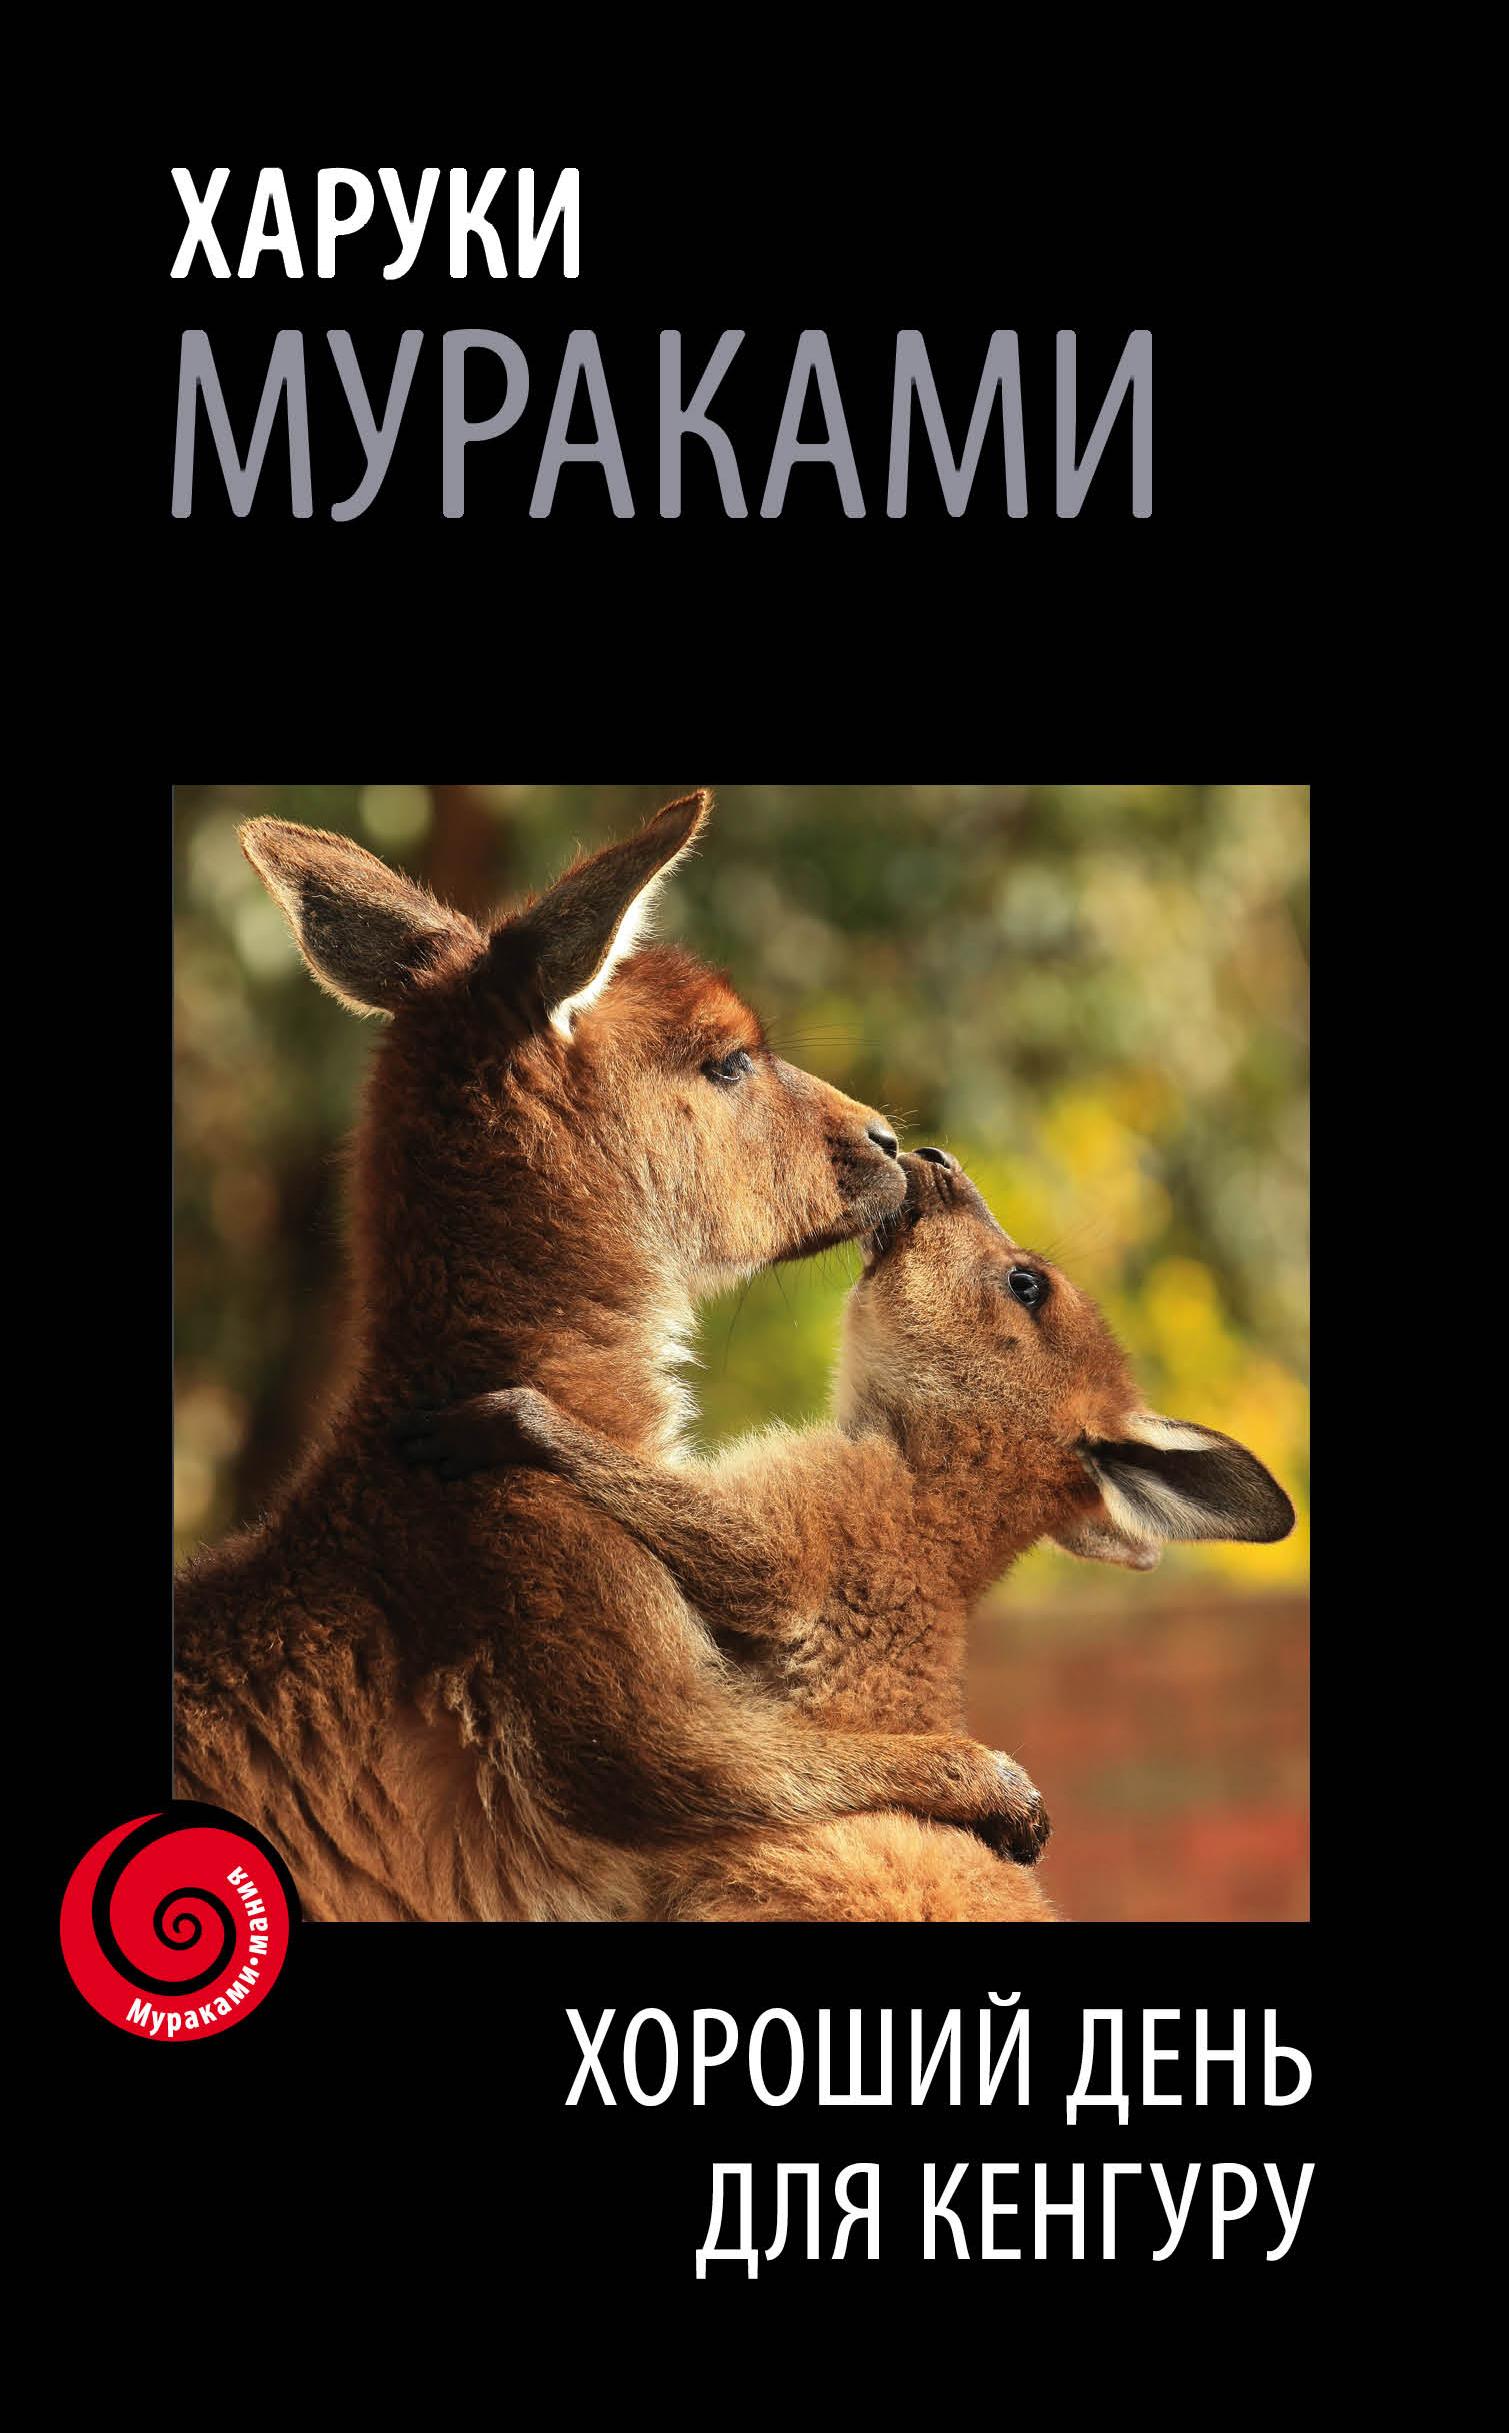 Мураками Харуки Хороший день для кенгуру мураками х хороший день для кенгуру